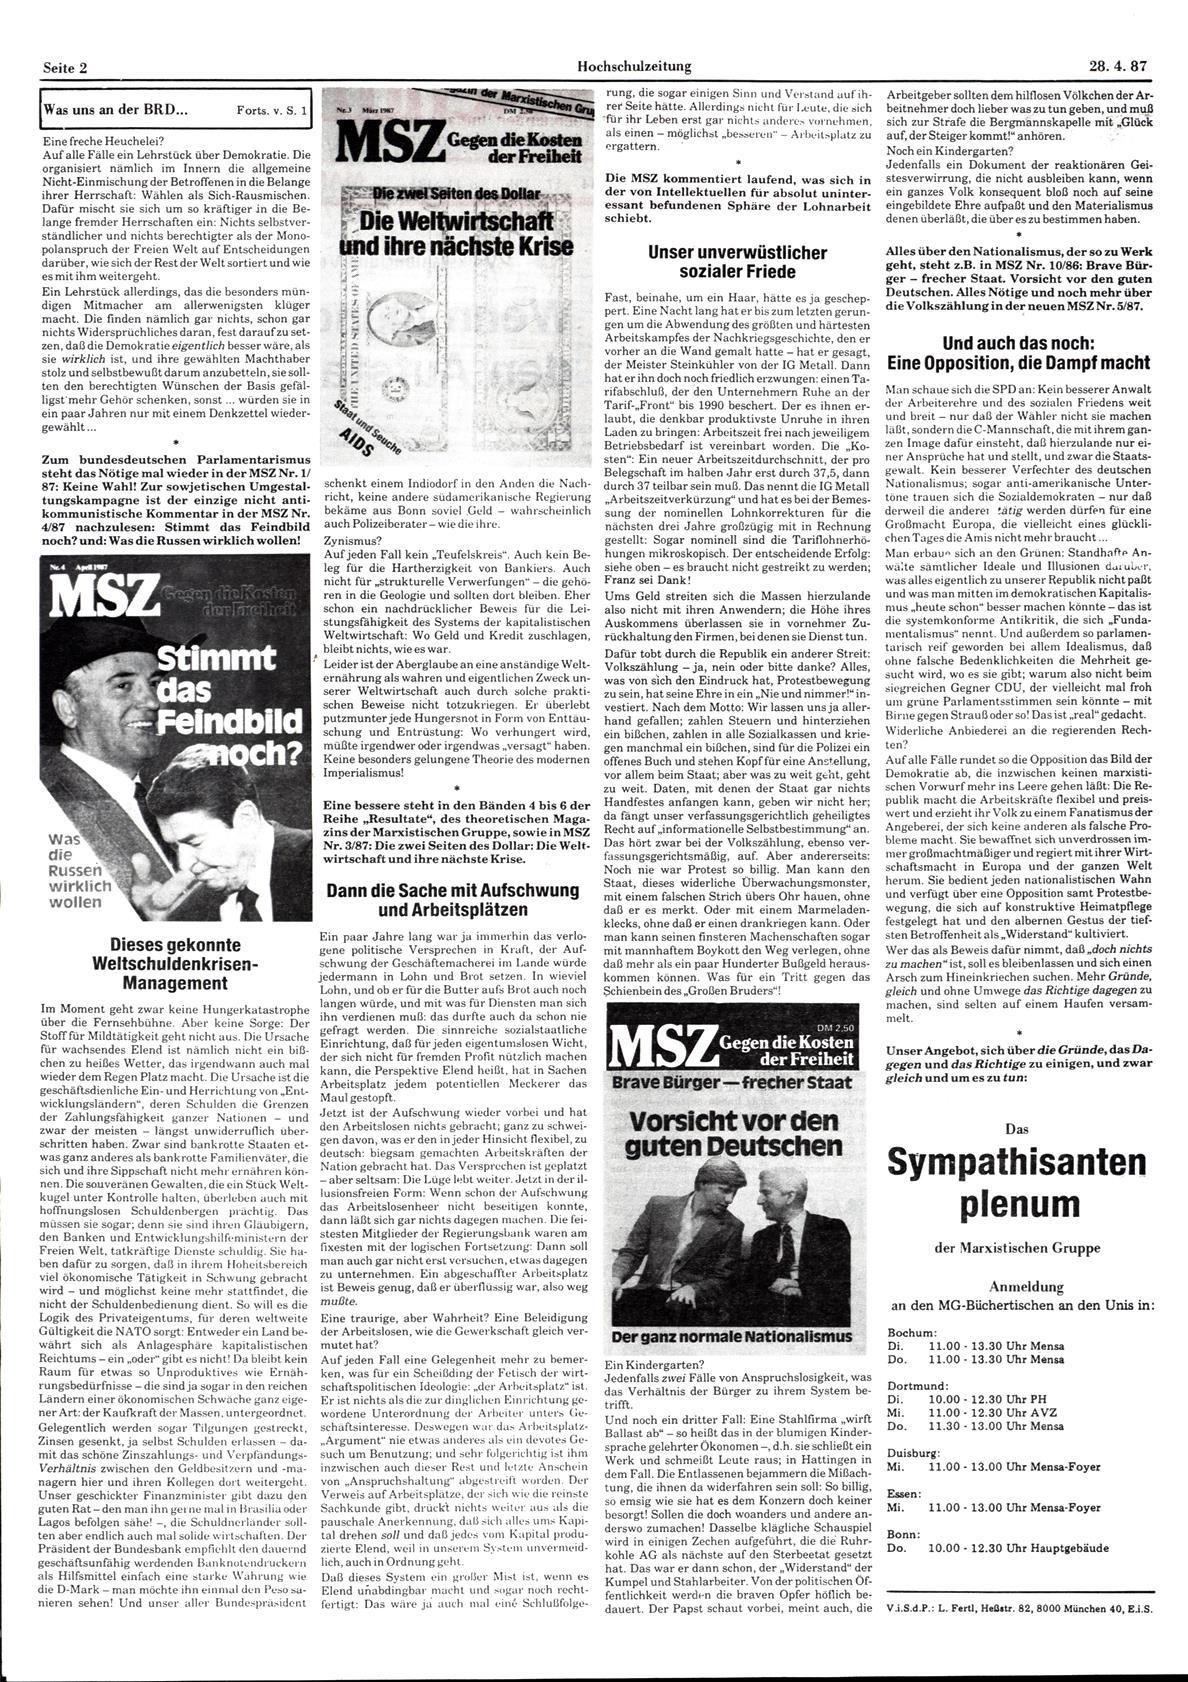 Bochum_BHZ_19870428_147_002